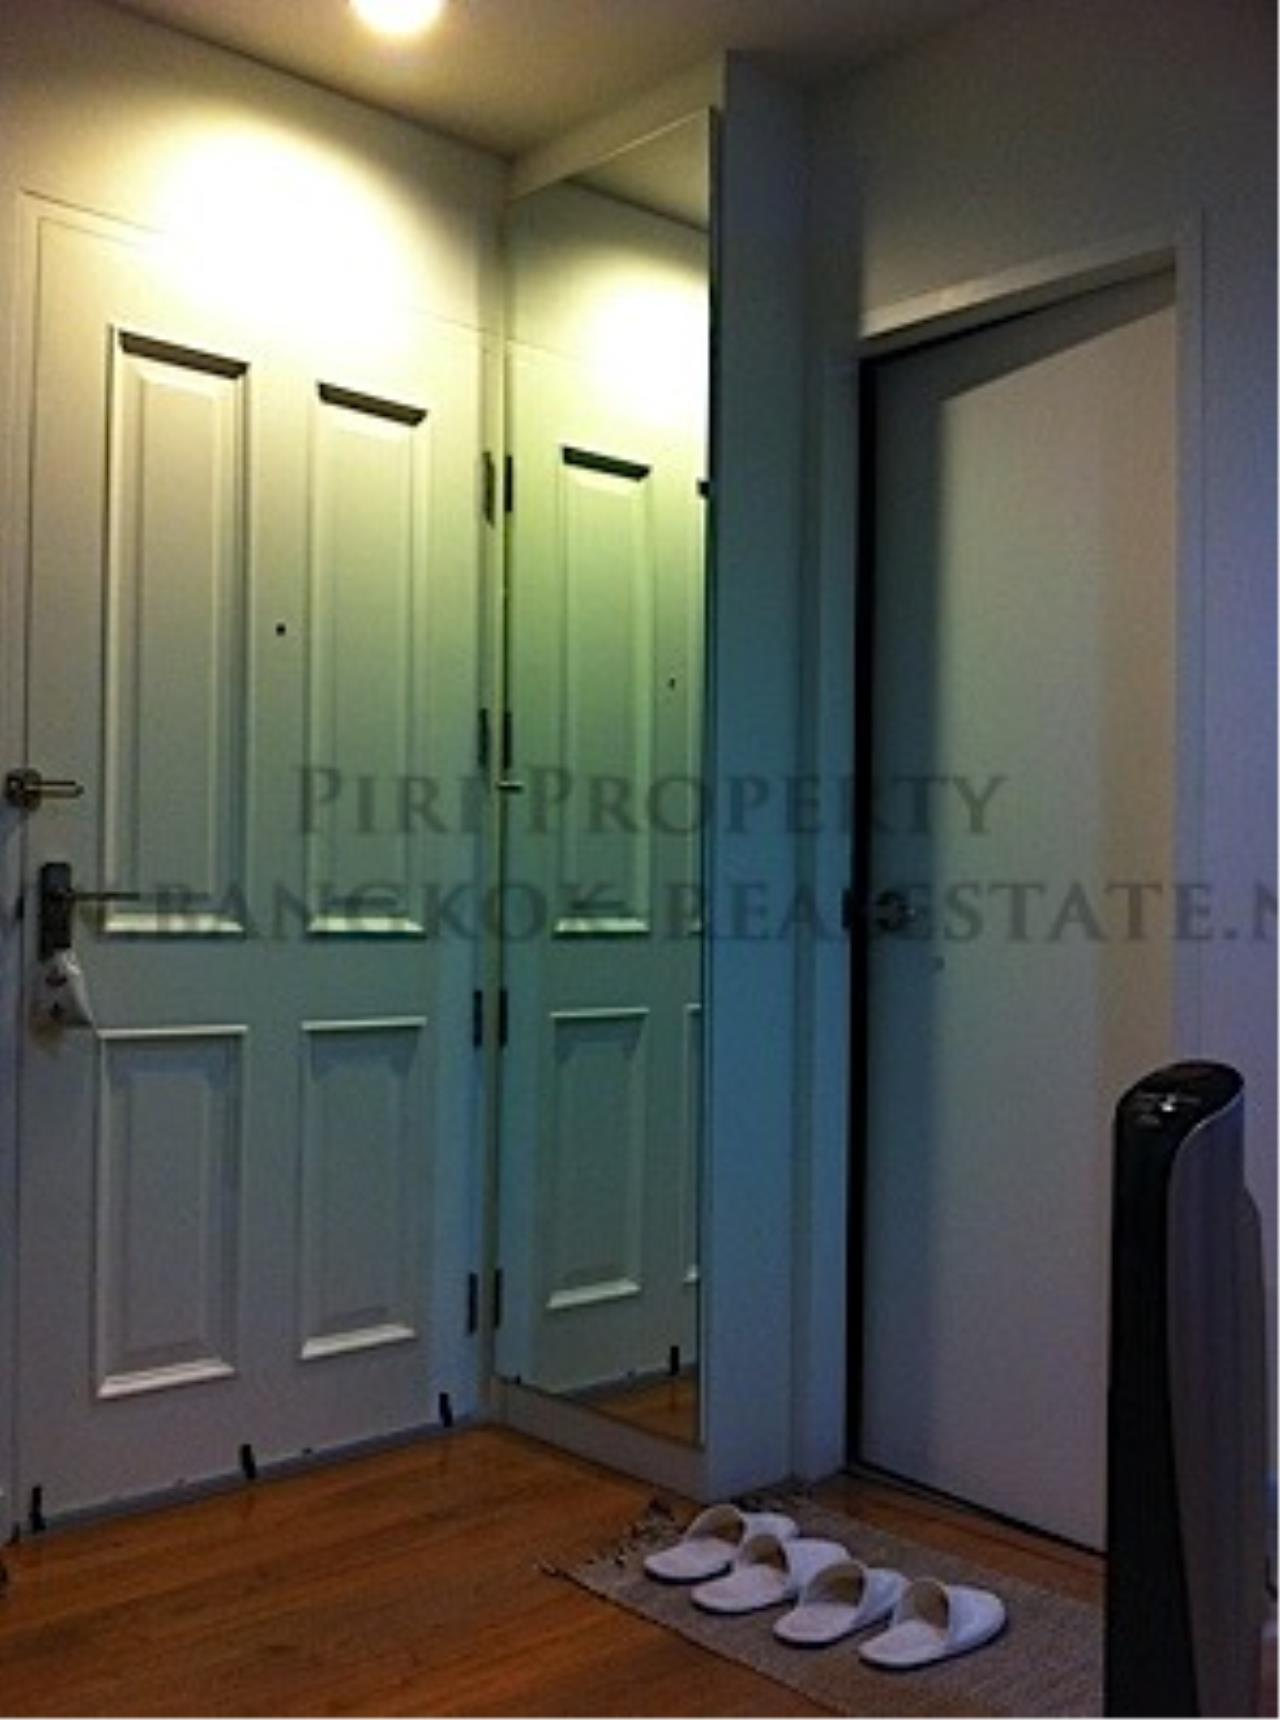 Piri Property Agency's Condo One X - Studio for Rent 6